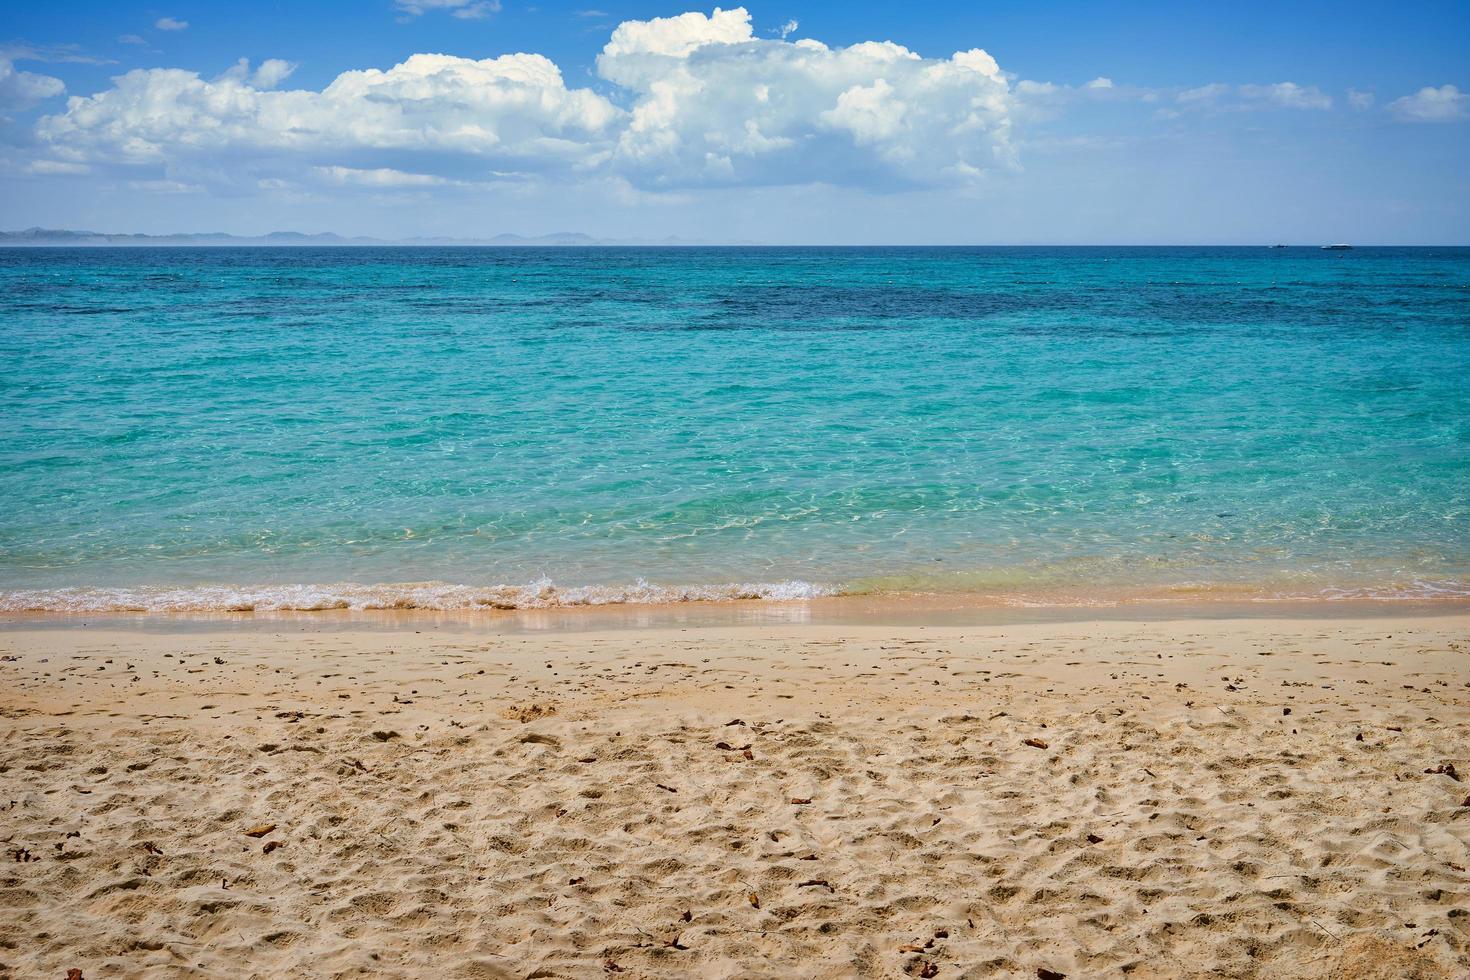 strand en water met bewolkte blauwe hemel foto